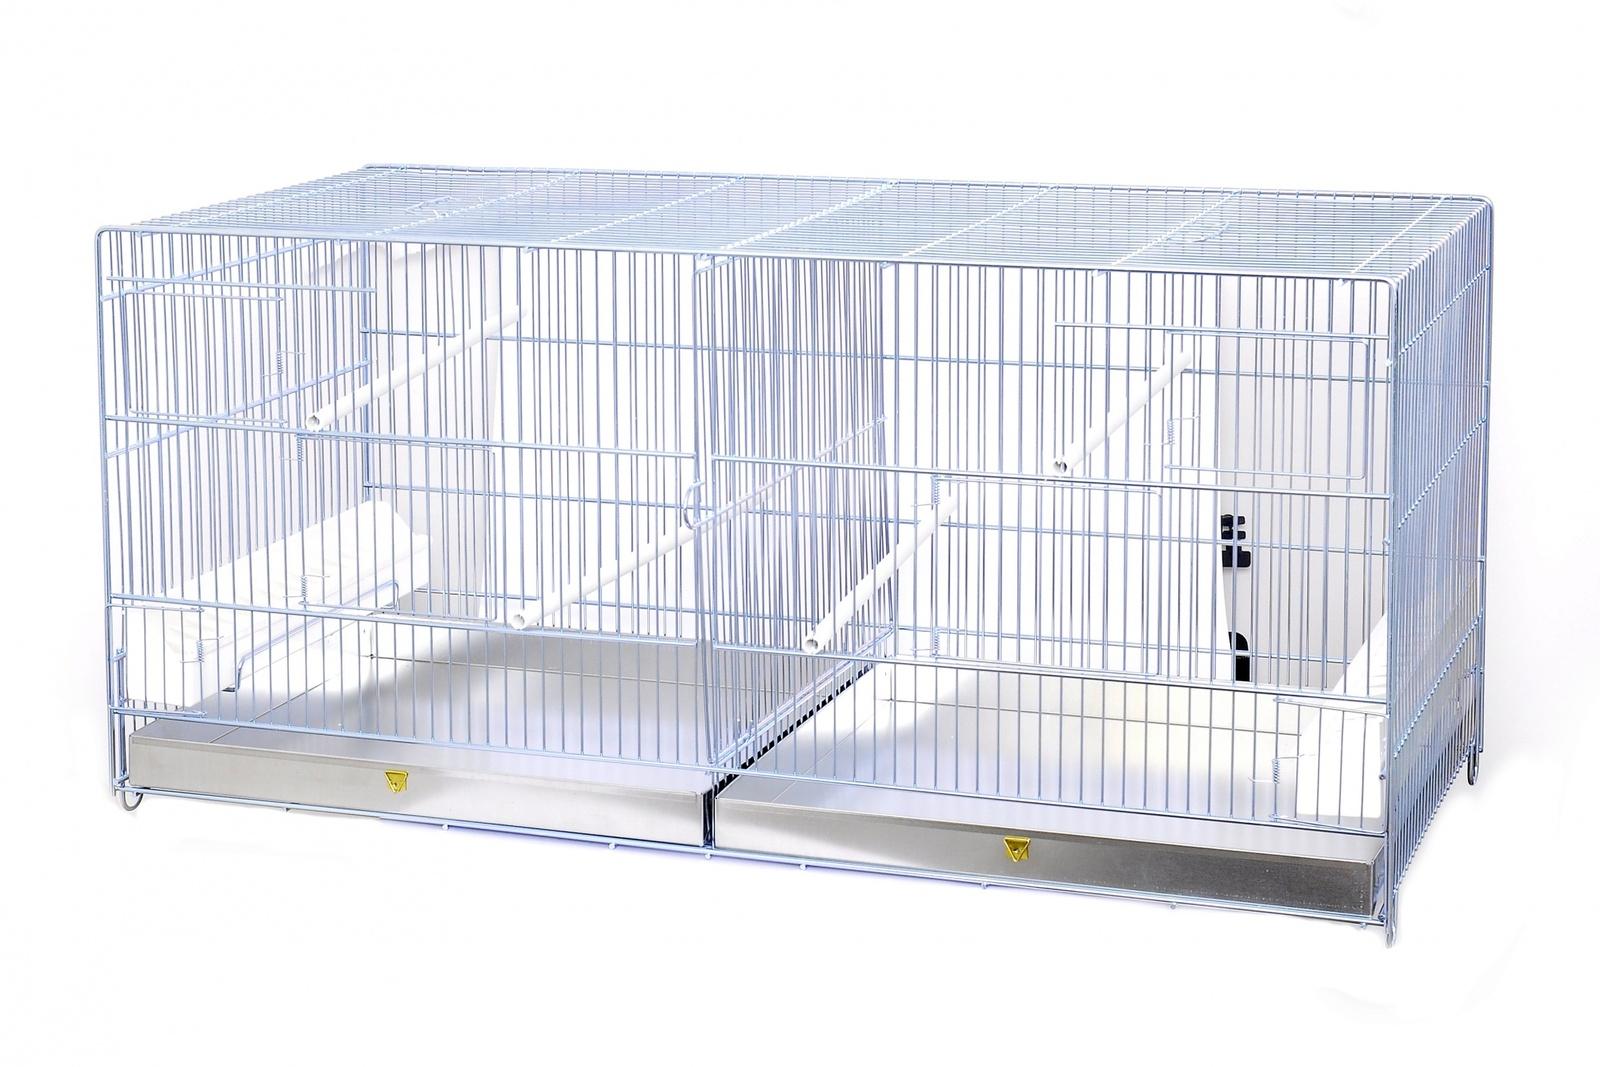 benelux Benelux Клетка для птиц двойная 90*30*45 см (Metal birdcage 2 parts 90x30x45 cm) 1560057 51073